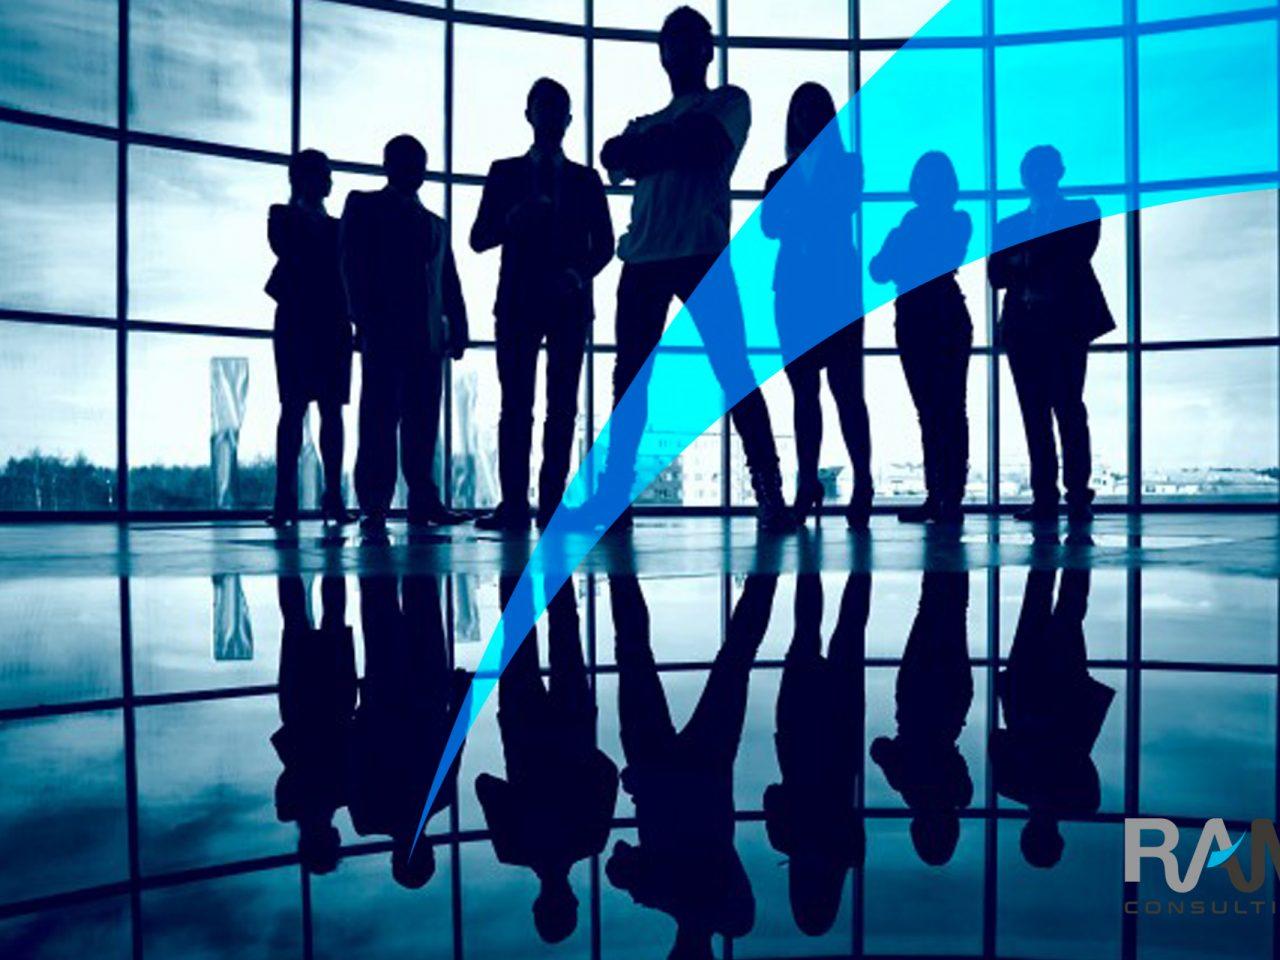 https://ram-consulting.org/wp-content/uploads/2021/01/Leadership2-1280x960.jpg